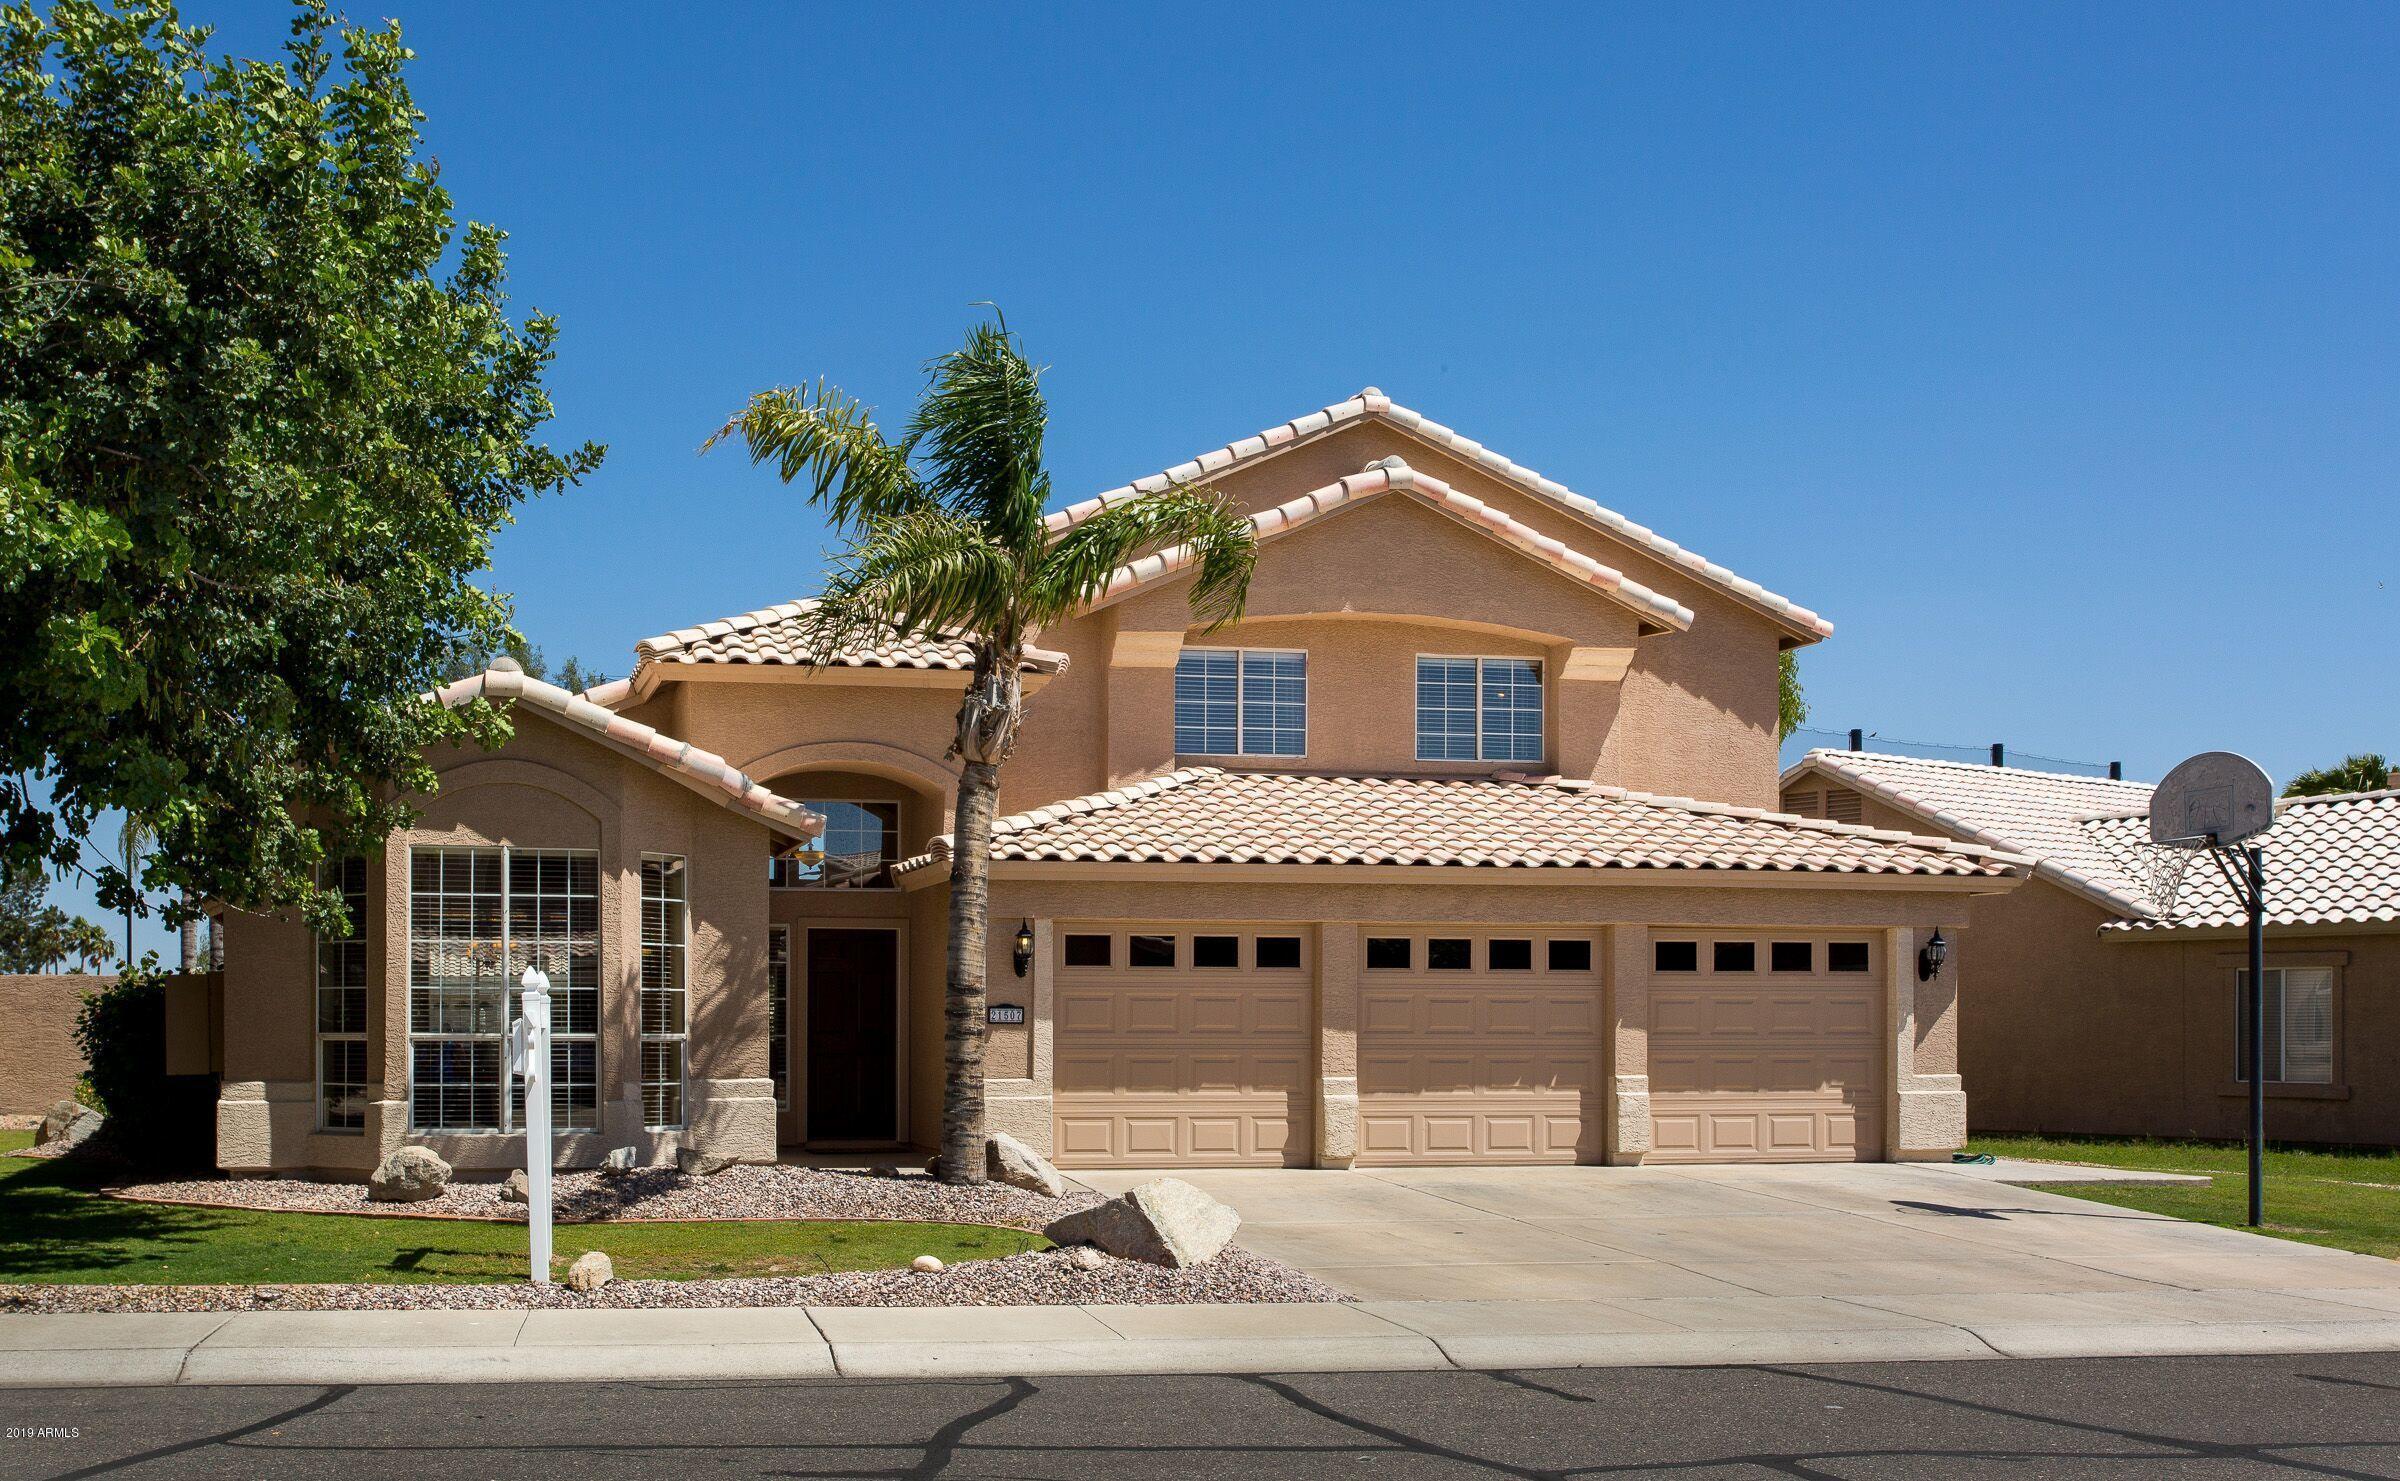 Photo of 21507 N 65TH Avenue, Glendale, AZ 85308